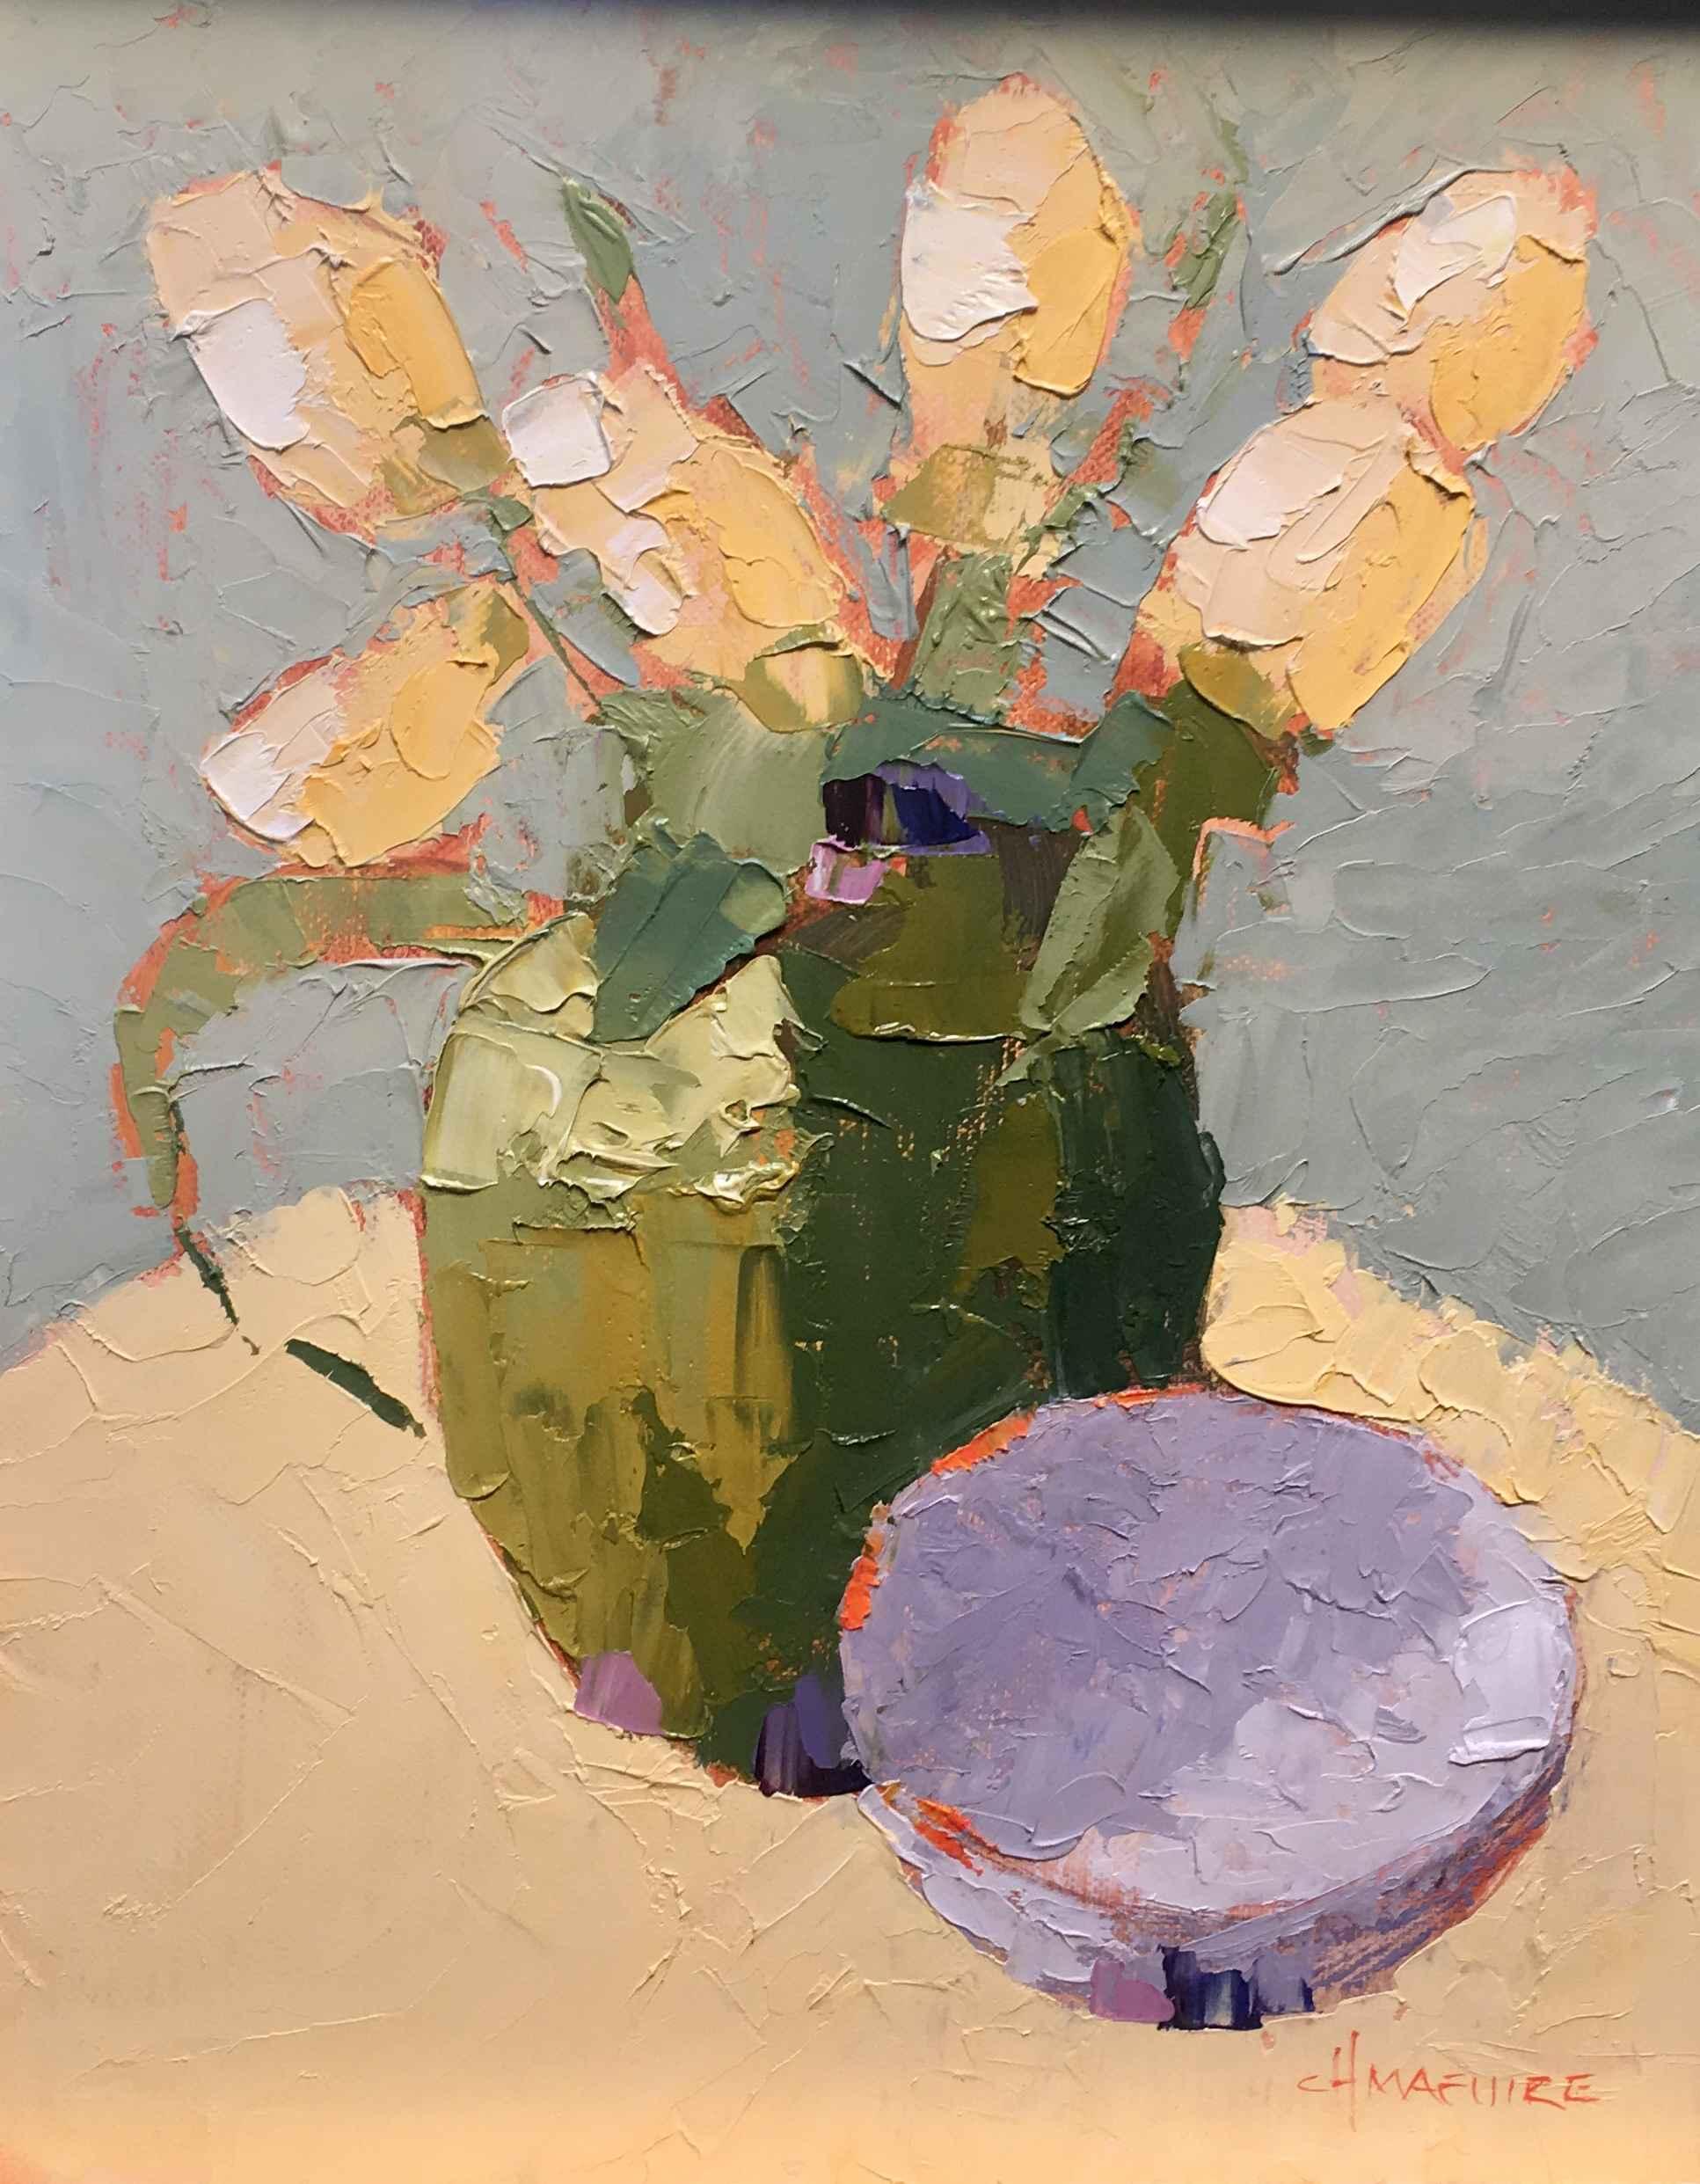 Tulips & Lavander Bowl by  Carol Maguire - Masterpiece Online